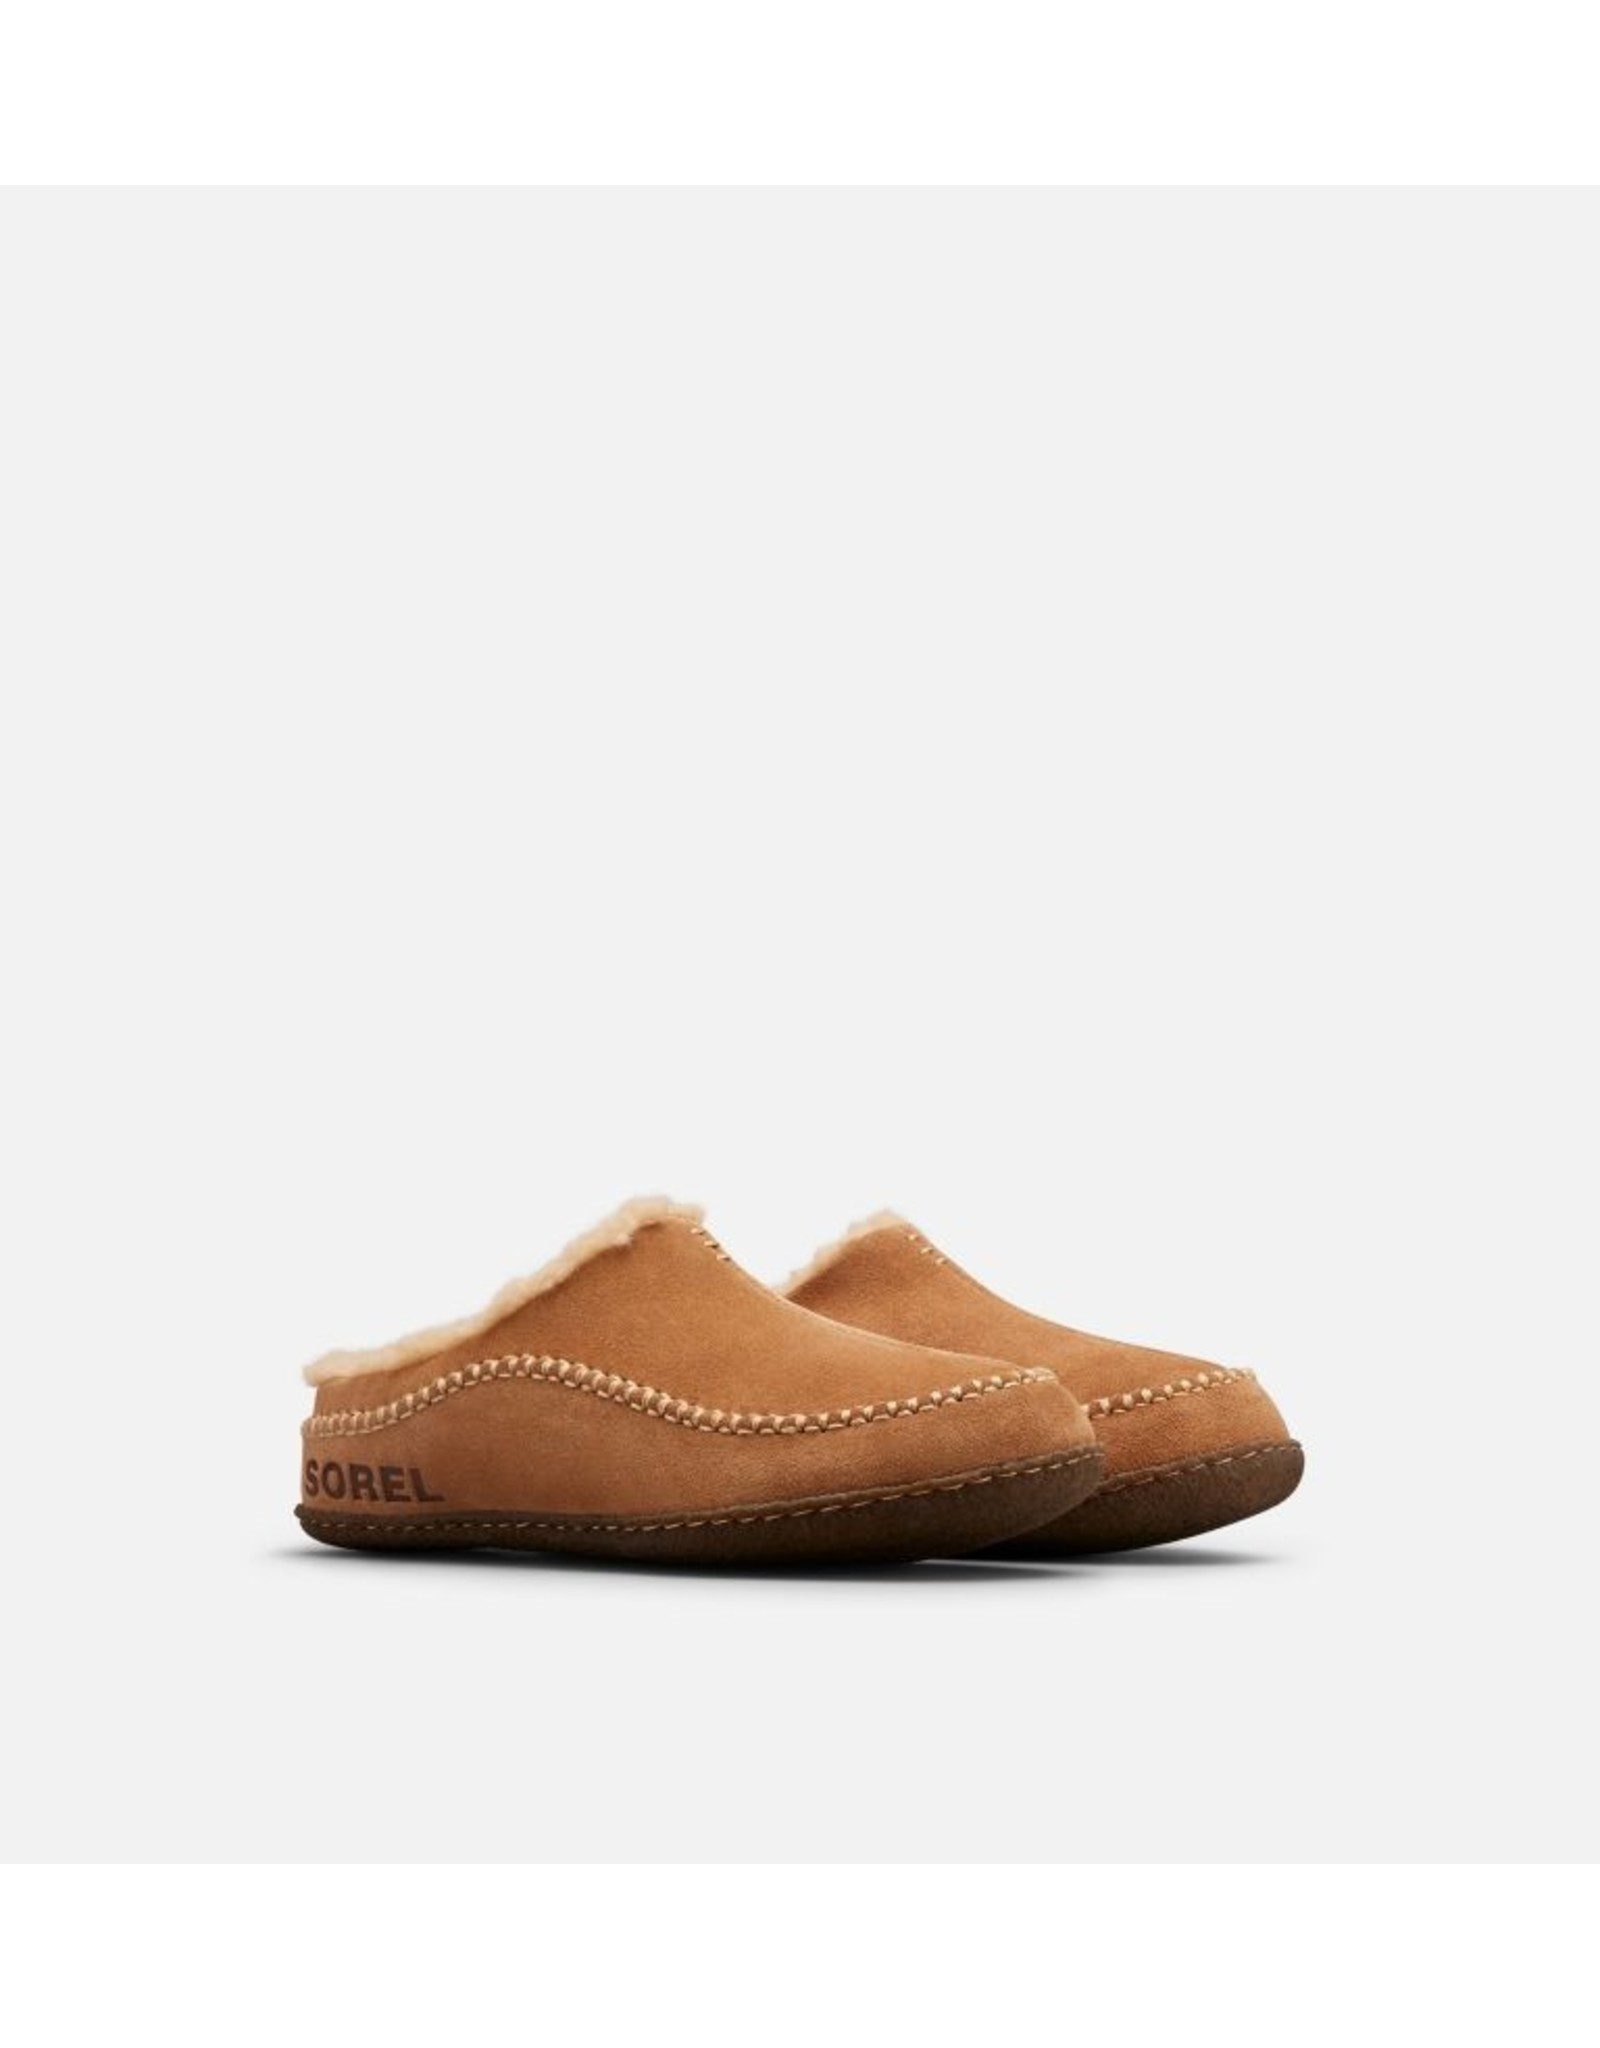 SOREL MEN'S FALCON RIDGE II SLIPPER-CAMEL BROWN/CURRY